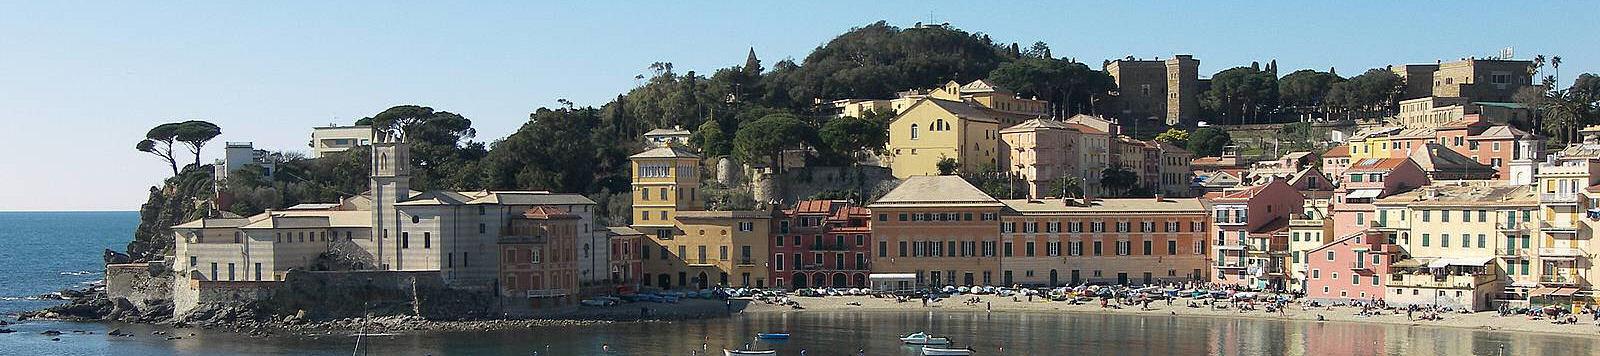 Sestri-Levante-bay-of-silence-inlet1